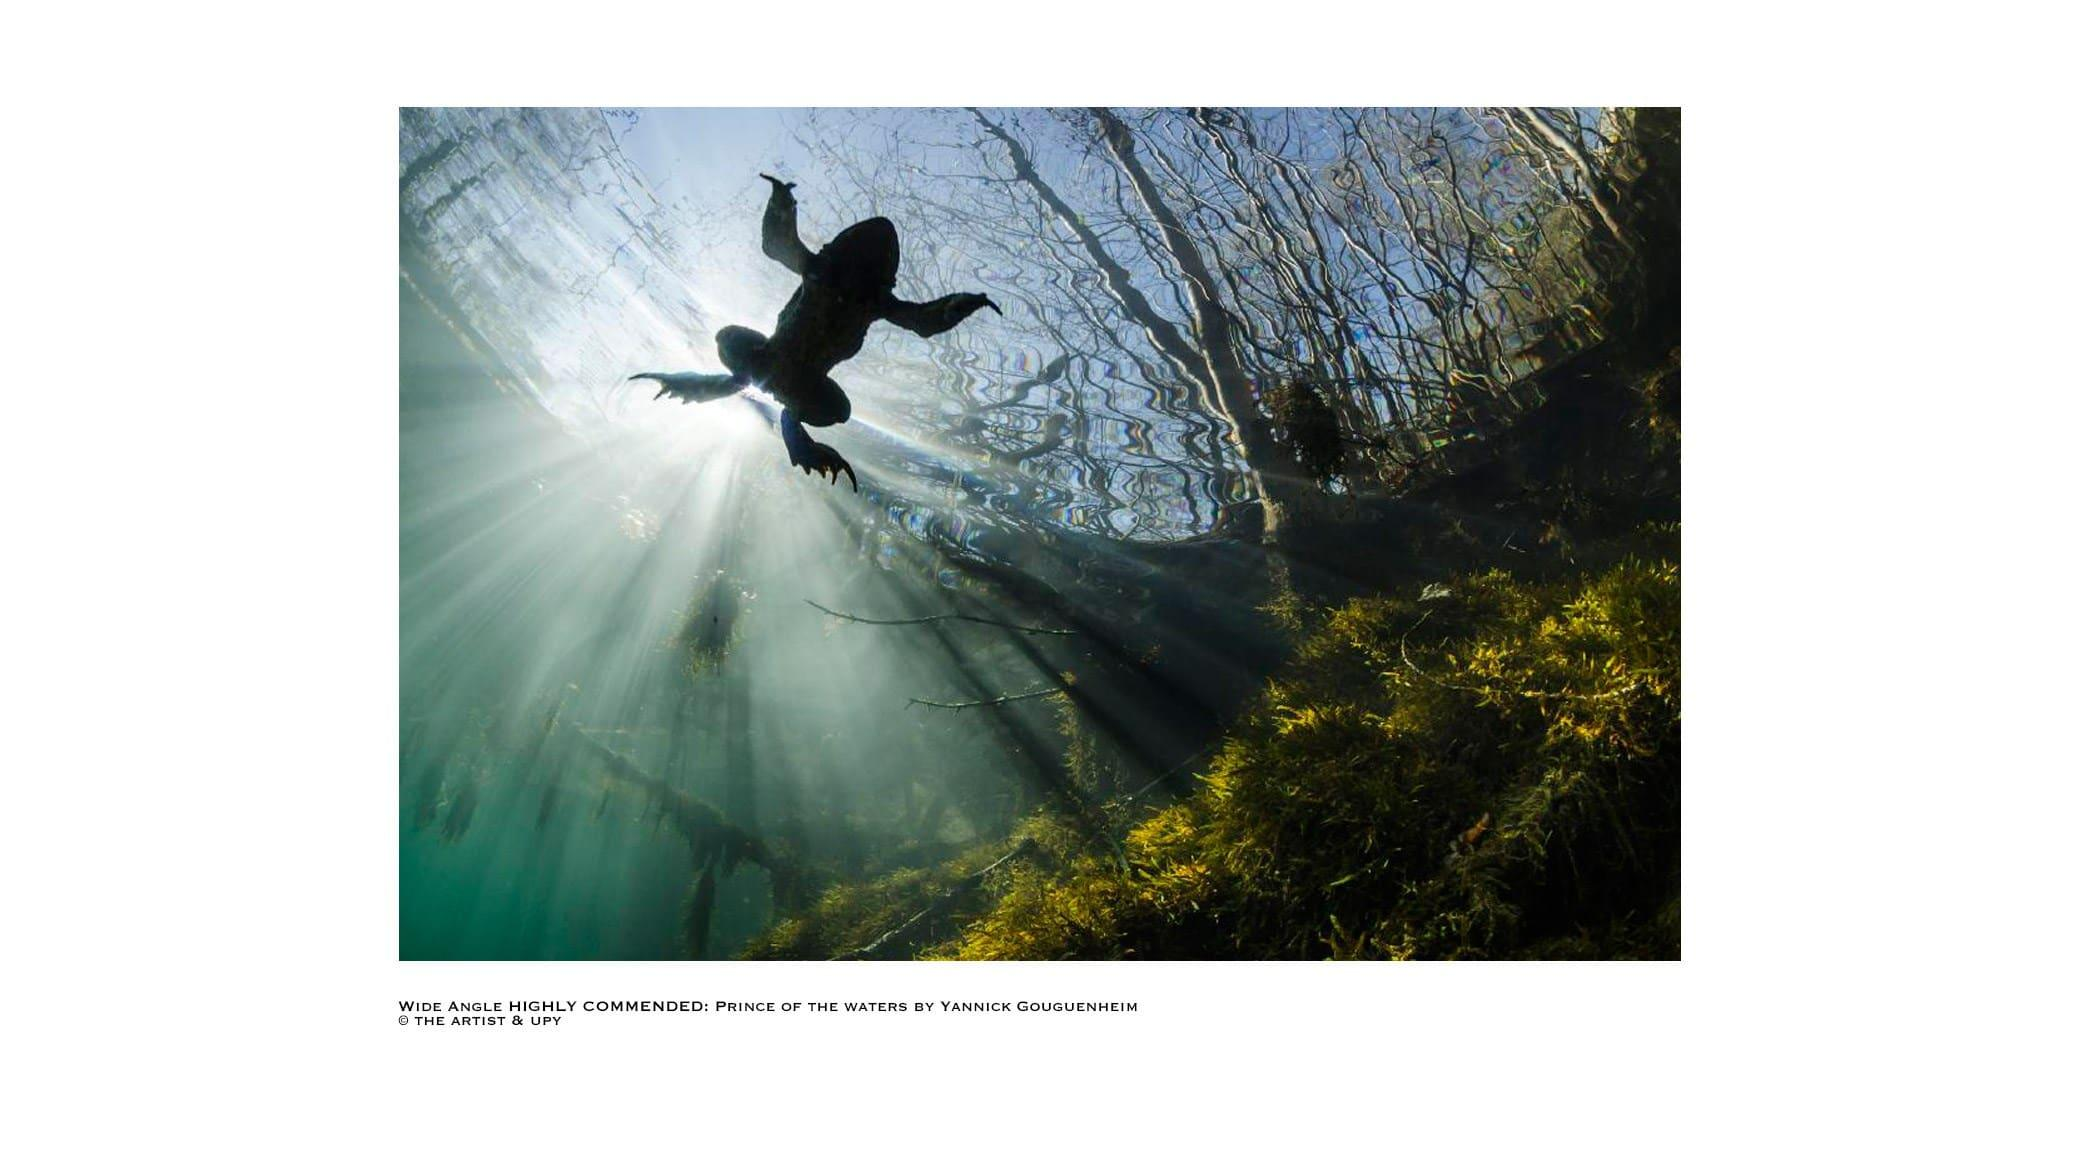 Underwater Photographer Year 2017